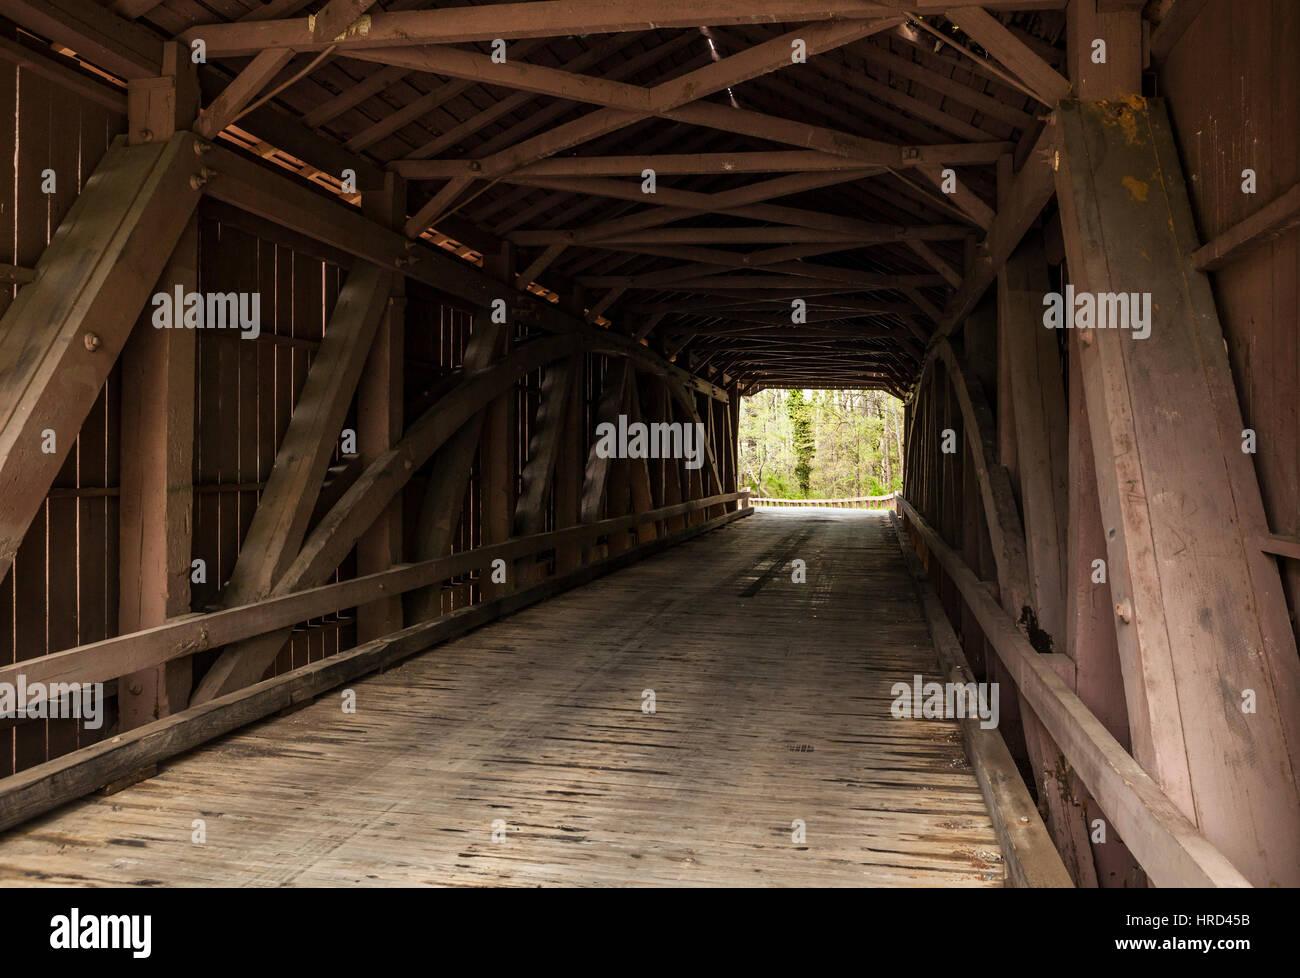 The Jericho covered bridge near Jerusalem in Harford County, Maryland, USA. - Stock Image